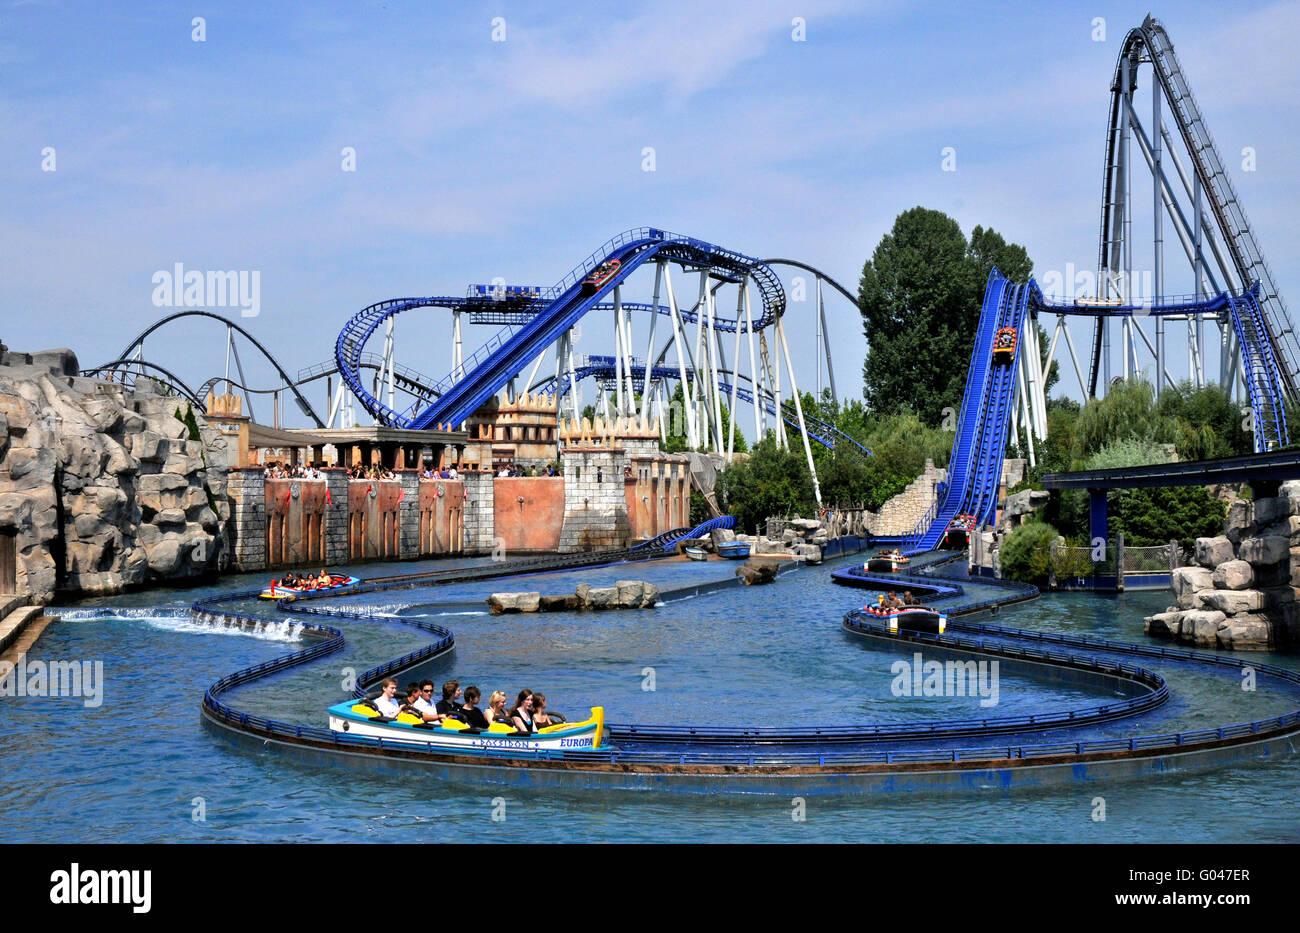 Water rollercoaster Poseidon, roller coaster, Europa-Park, Rust, Baden-Wurttemberg, Germany / Europa Park - Stock Image